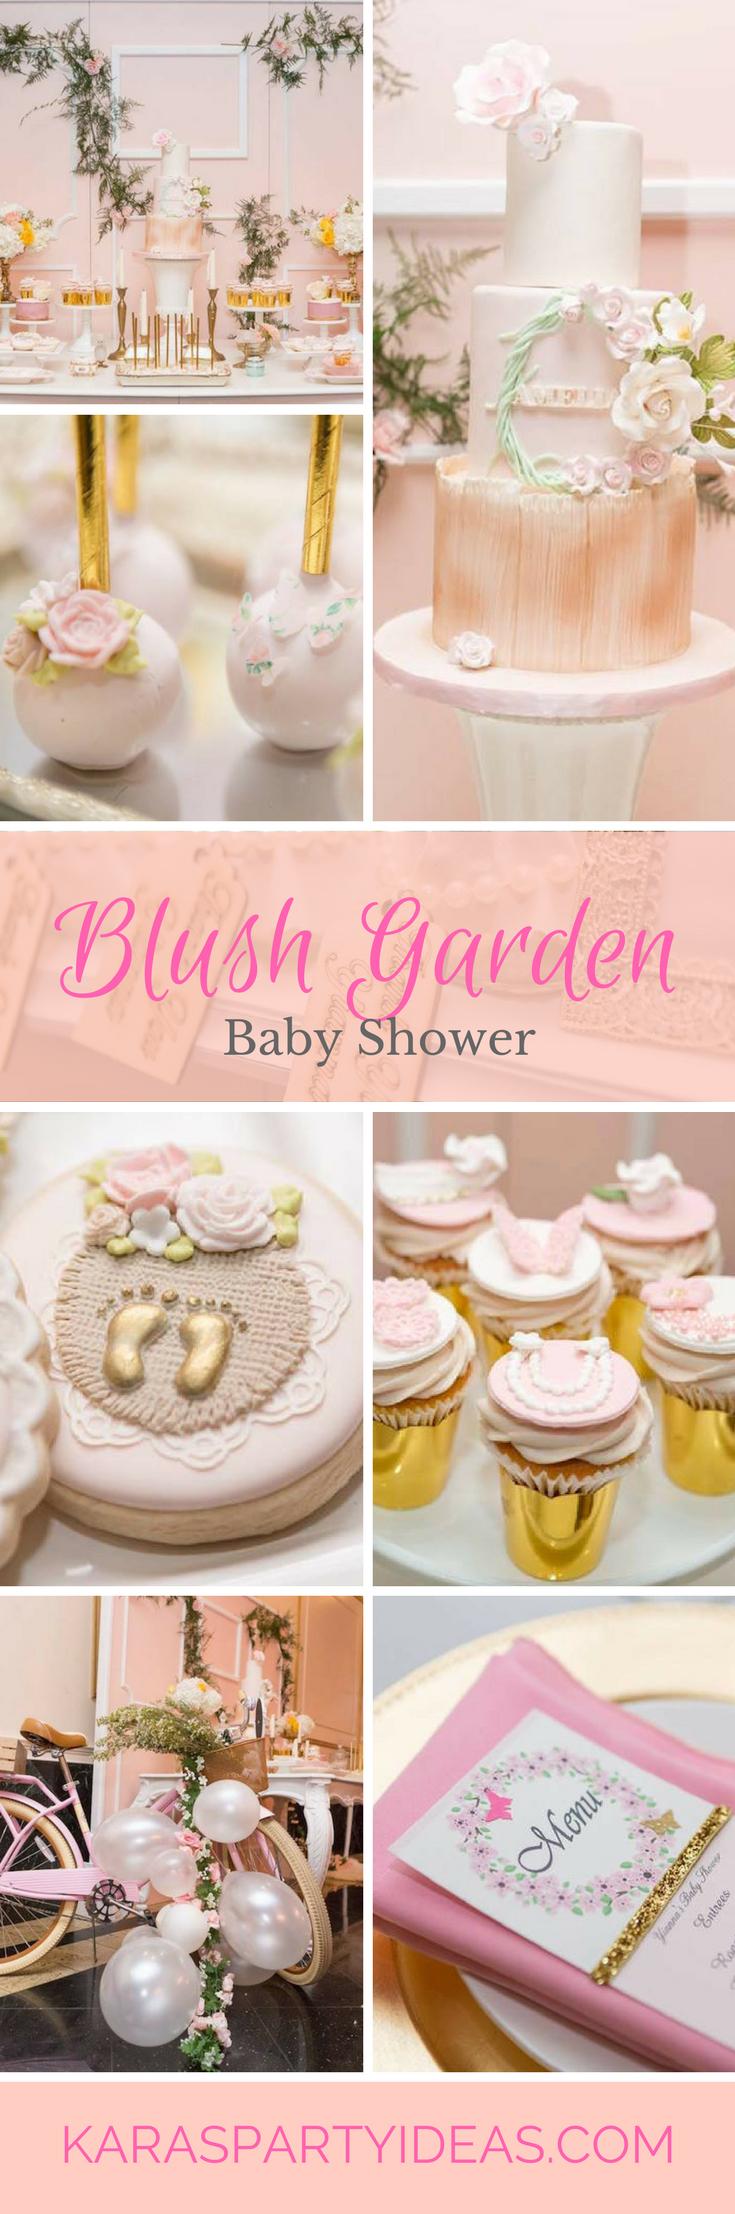 Blush Garden Baby Shower via Kara's Party Ideas